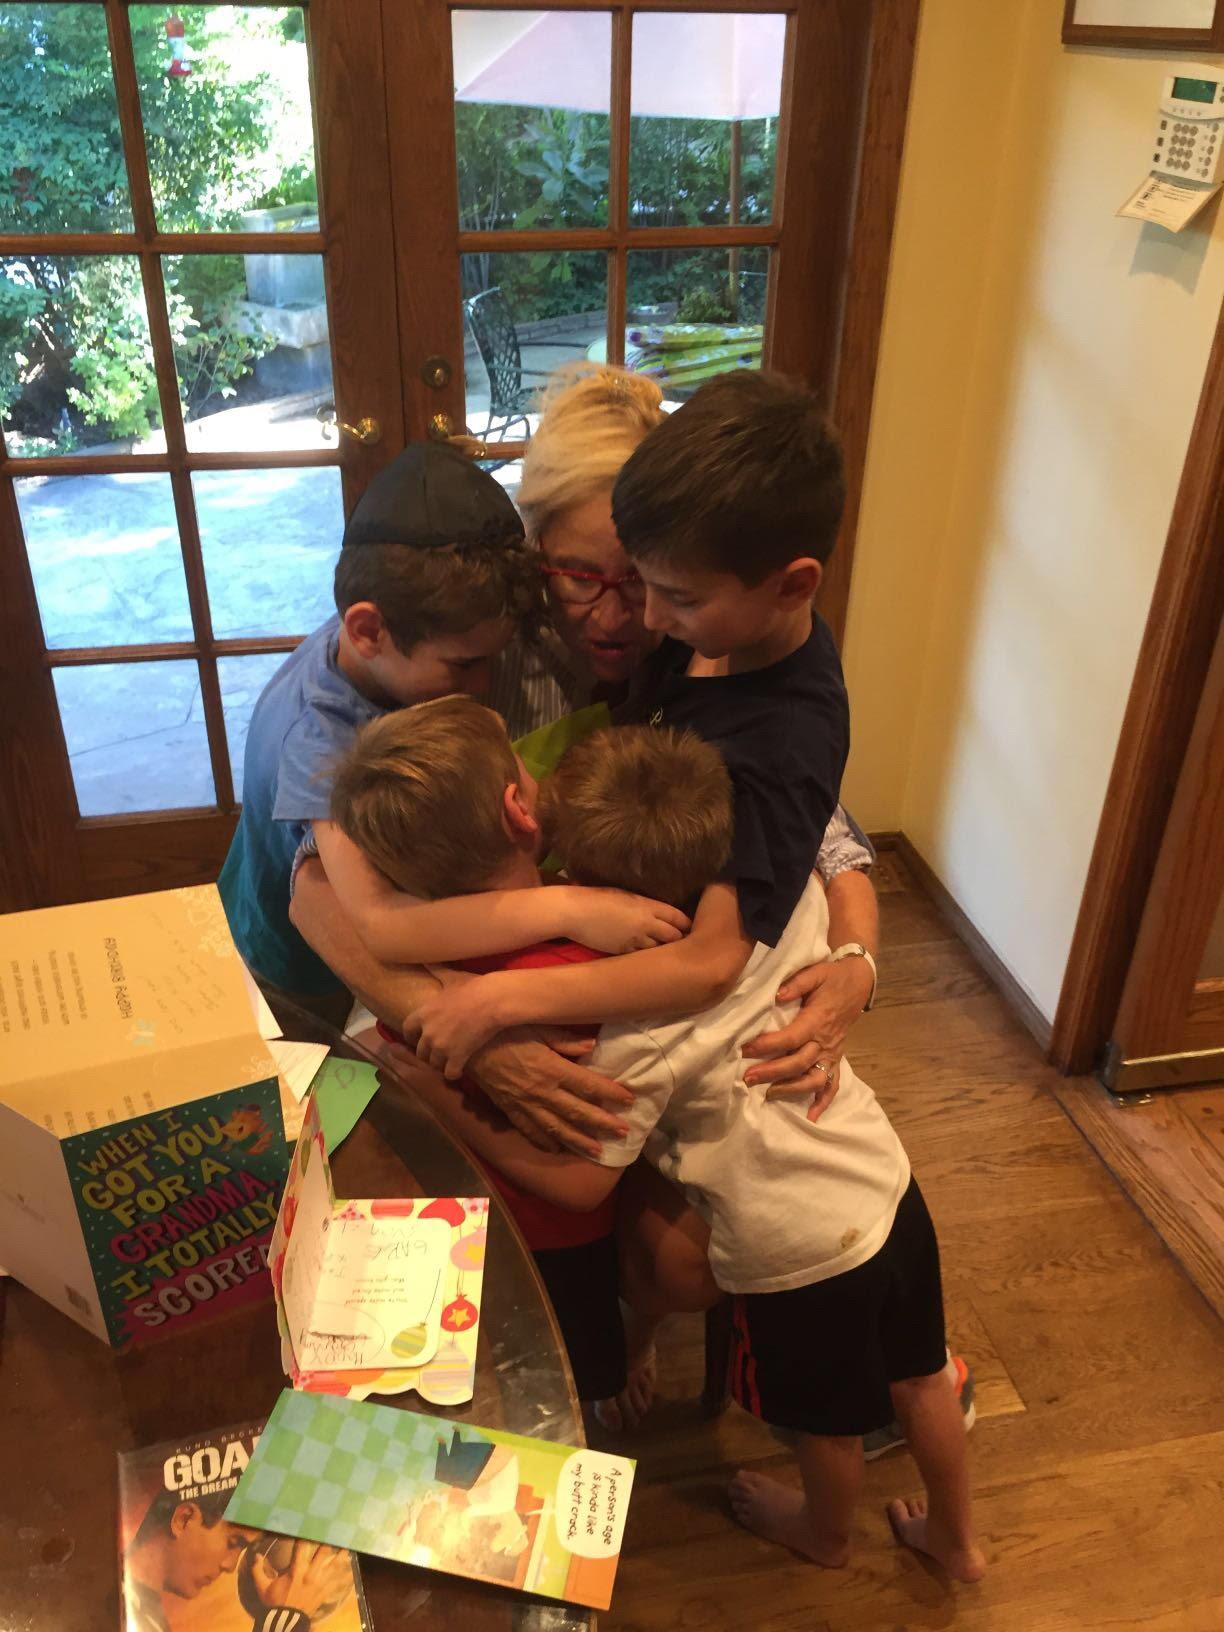 Second Group hug Jack jonah noah gabriel and Larraine Birthday hug 2016 at home shabbat